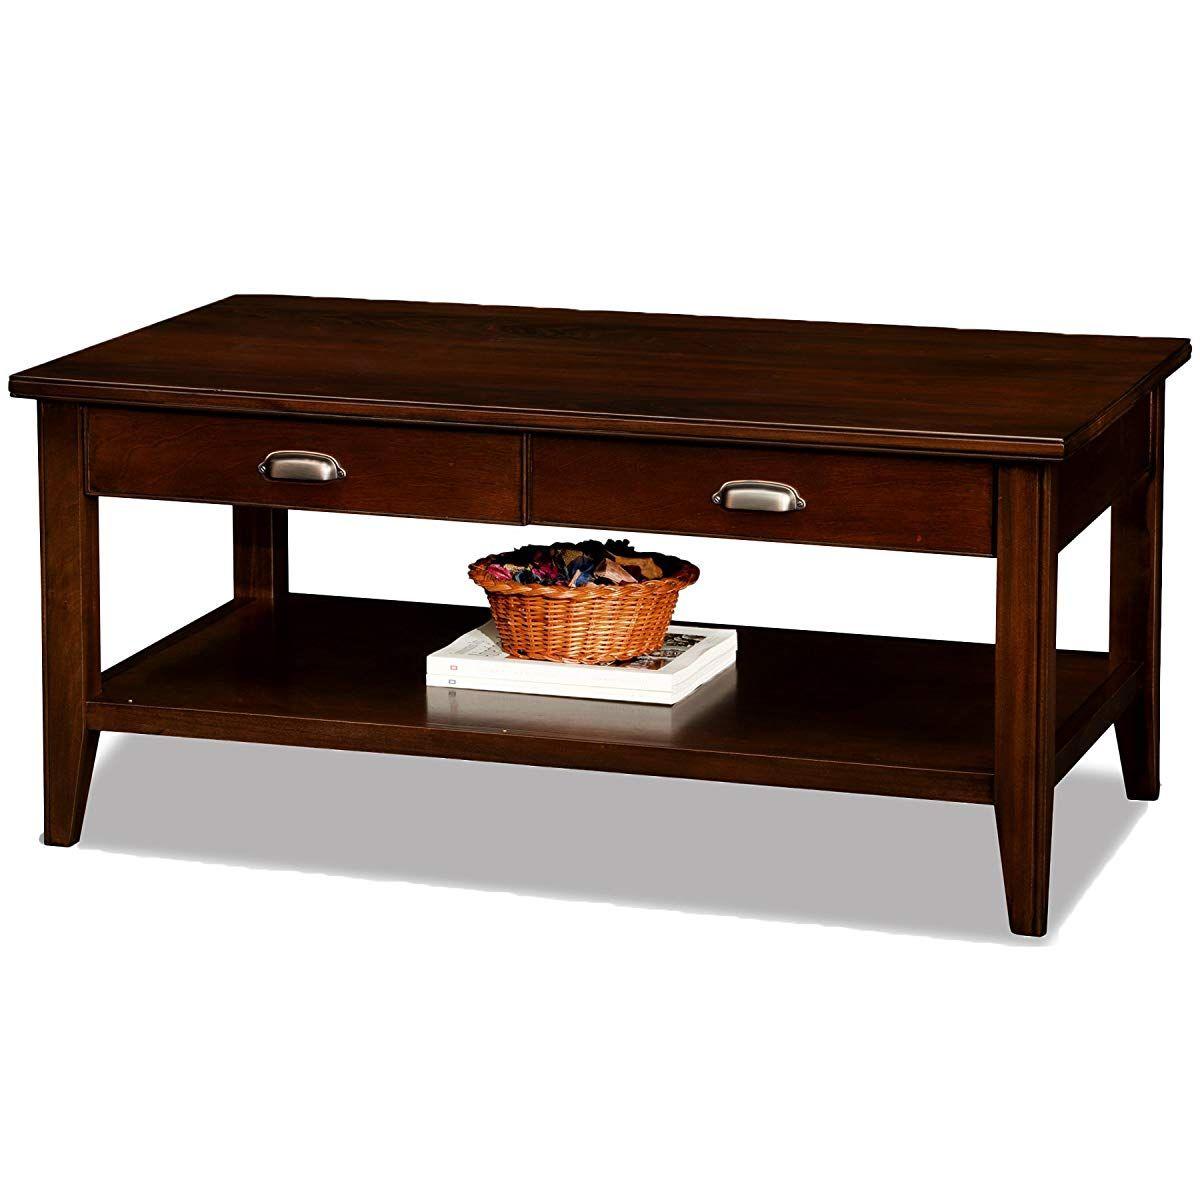 2 Drawer Coffee Table Coffee Table Wood Coffee Table With Drawers Coffee Table [ 1200 x 1200 Pixel ]